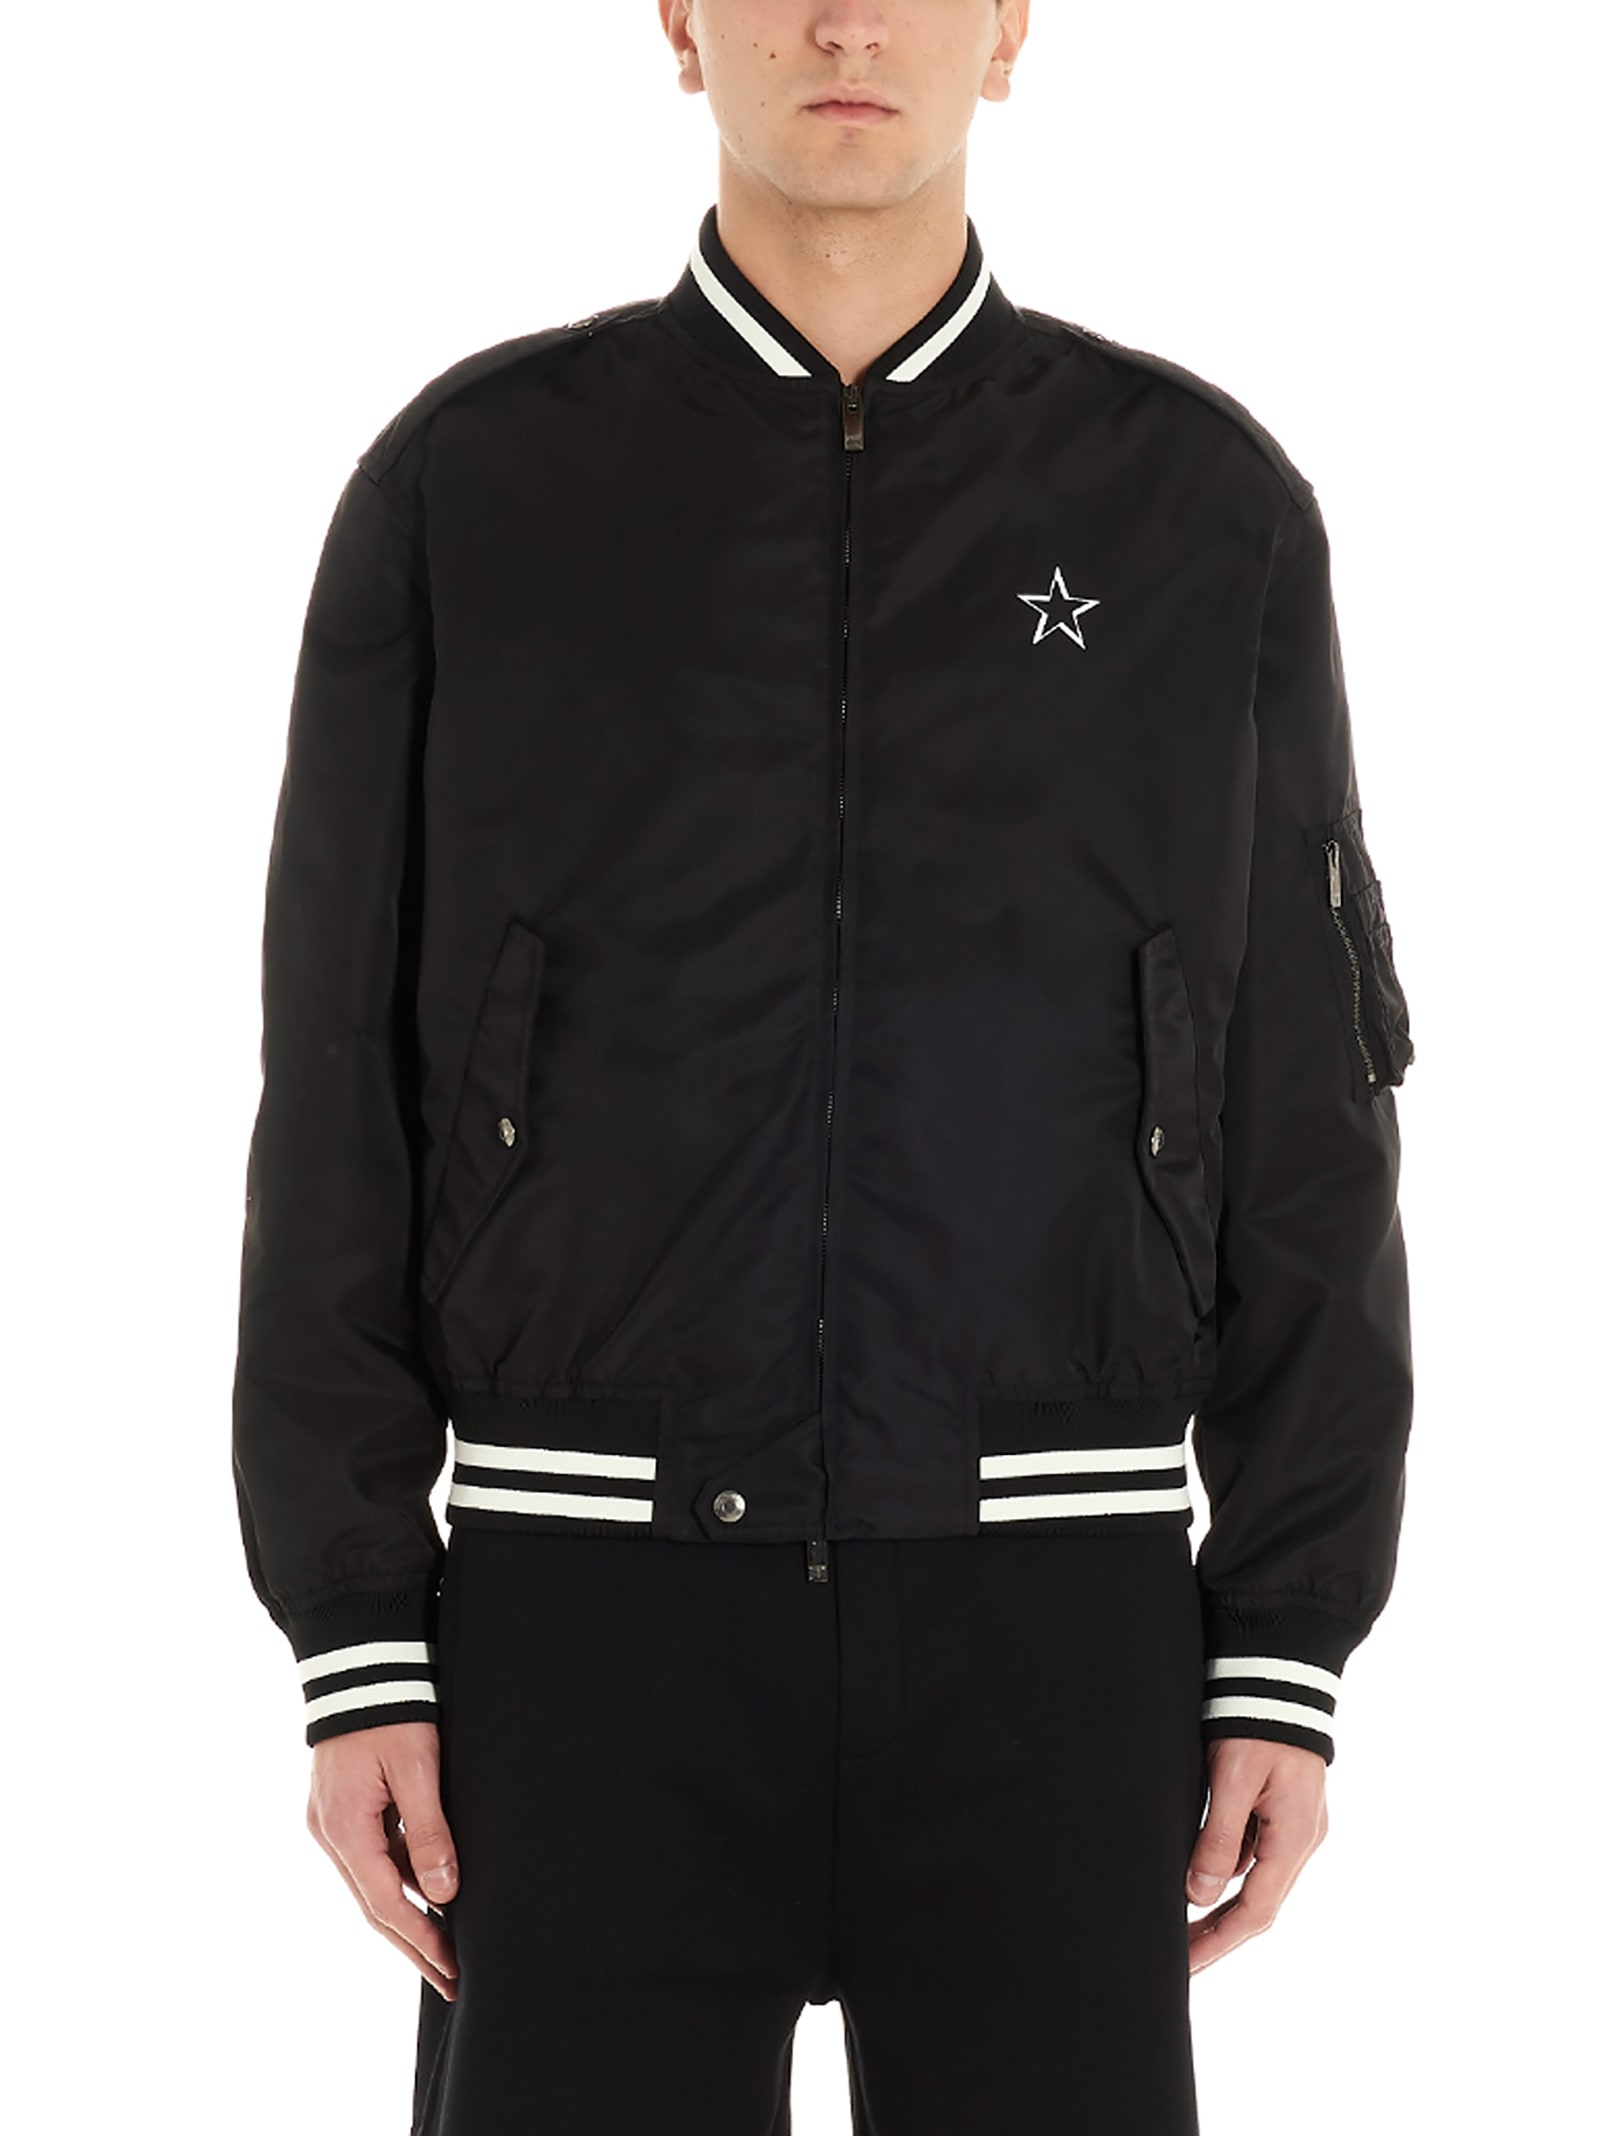 vltn Star Jacket From Valentino: Nylon vltn Star Bomber JacketComposition: 100% nylon